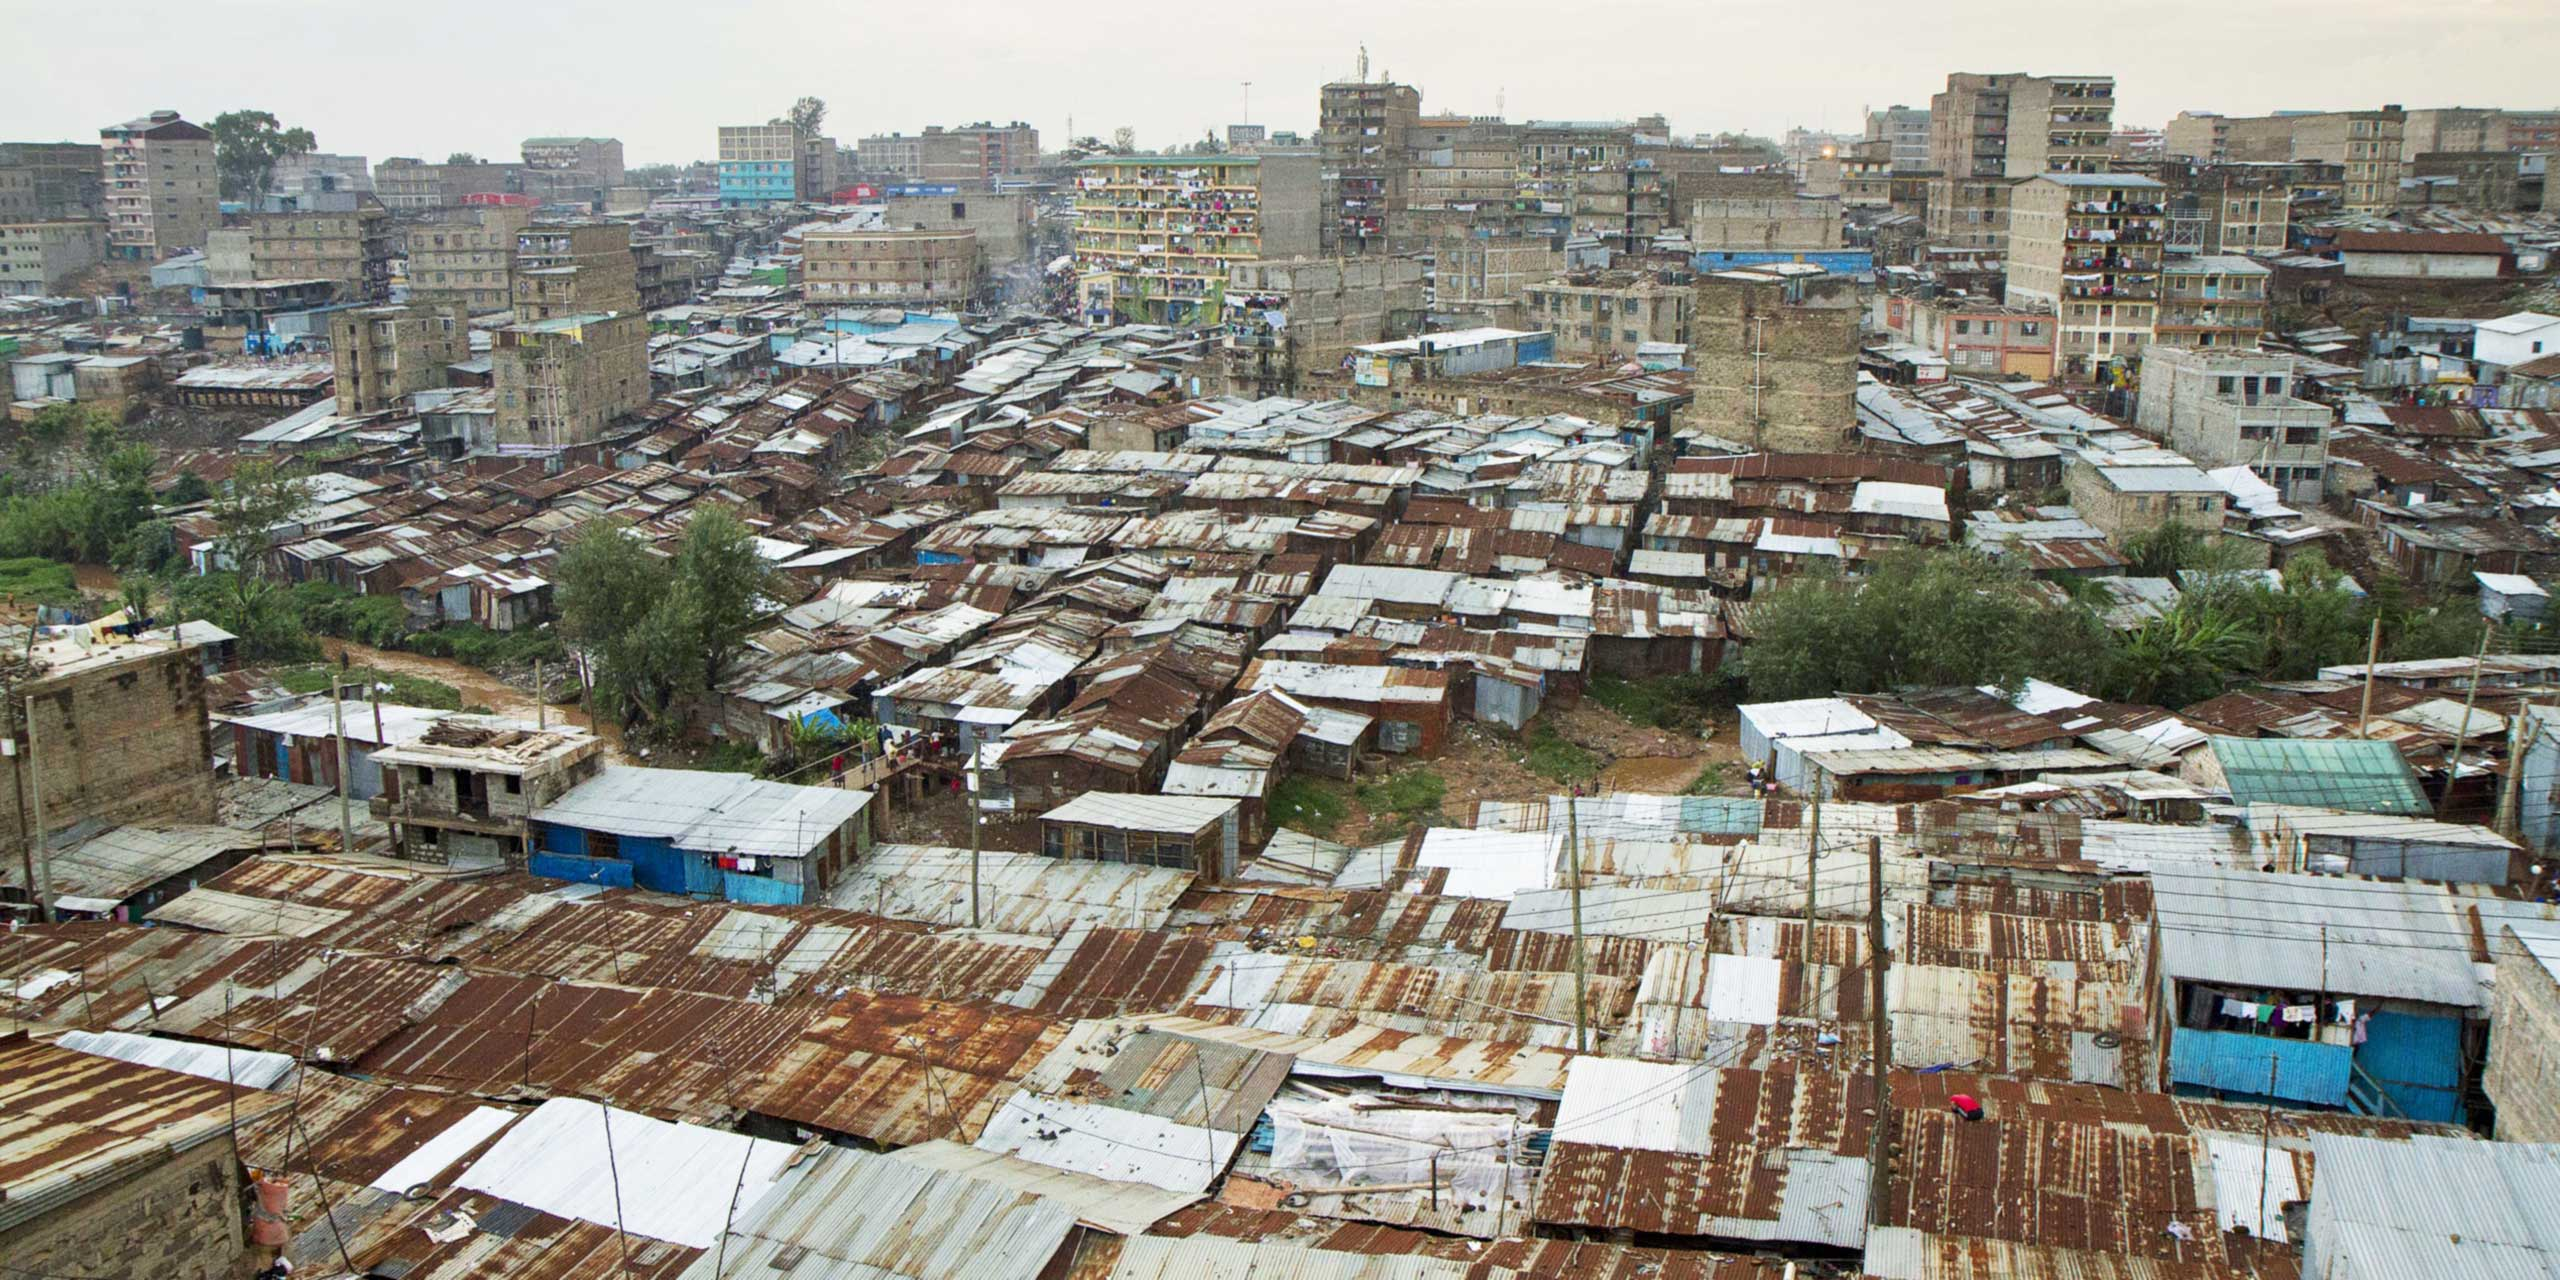 https://s12982.pcdn.co/wp-content/uploads/2015/01/slum-dwellers-international-sl1.jpg